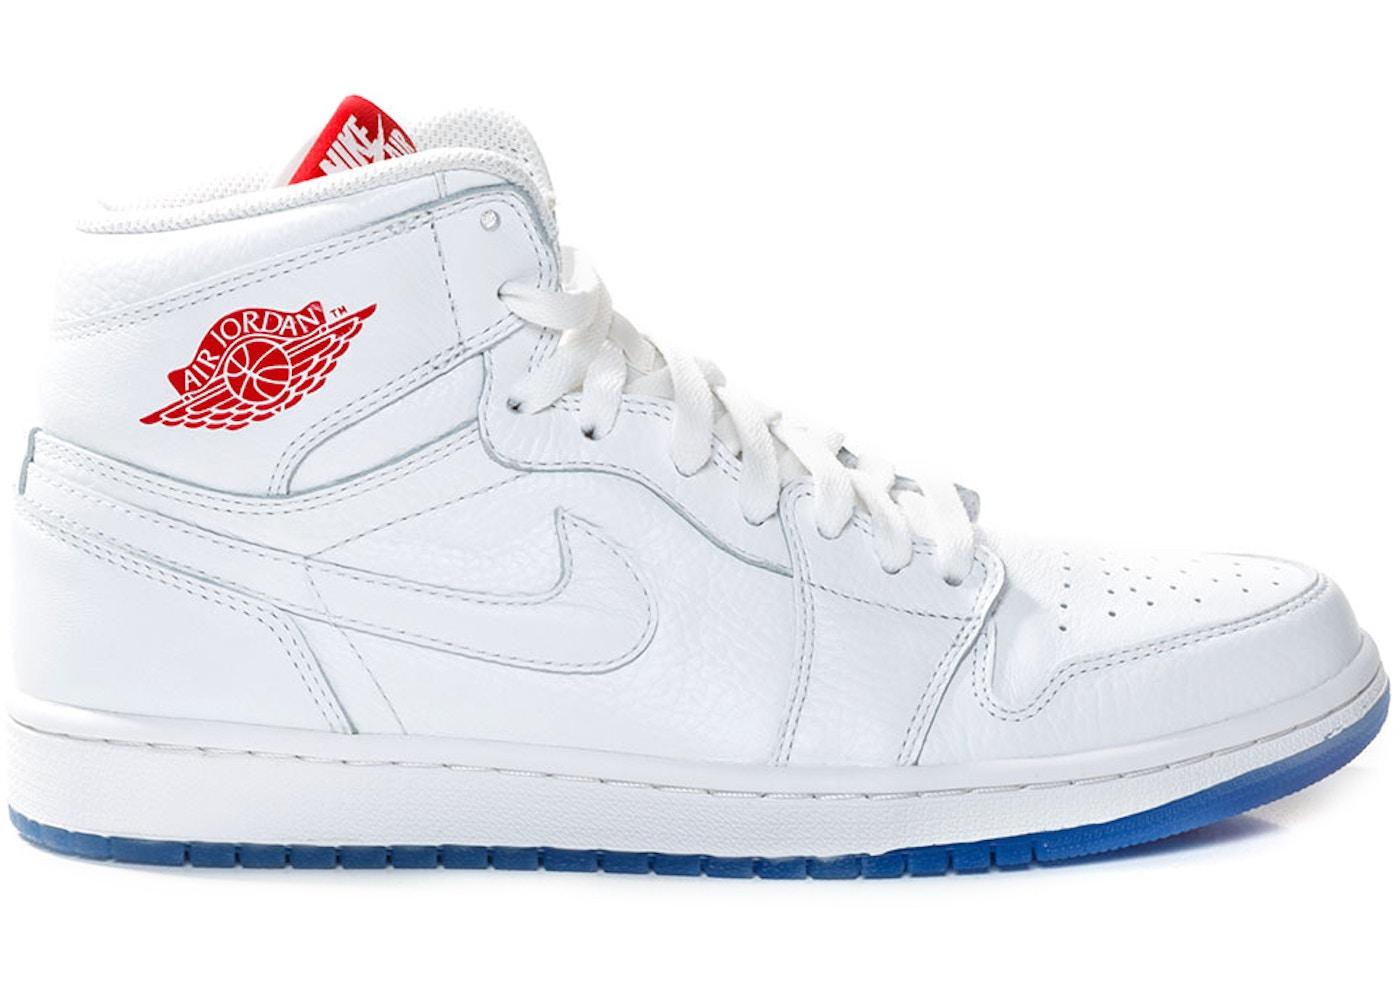 d597de3ec7fa Air Jordan 1 Size 10 Shoes - Last Sale